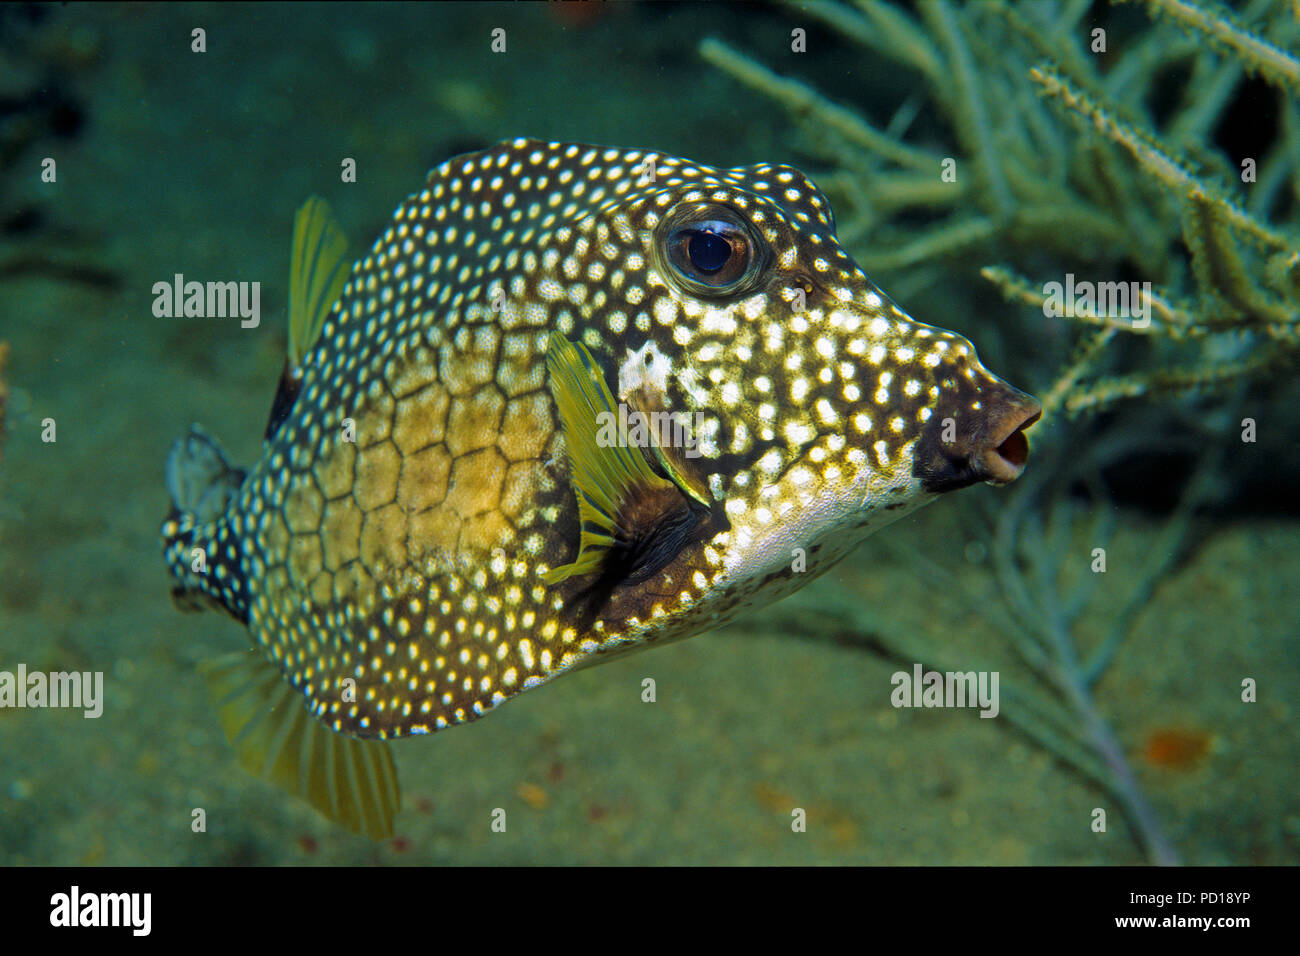 Perlen-Kofferfisch (Lactophrys triqueter), Curacao   Smooth Trunkfish (Lactophrys triqueter), Curacao - Stock Image